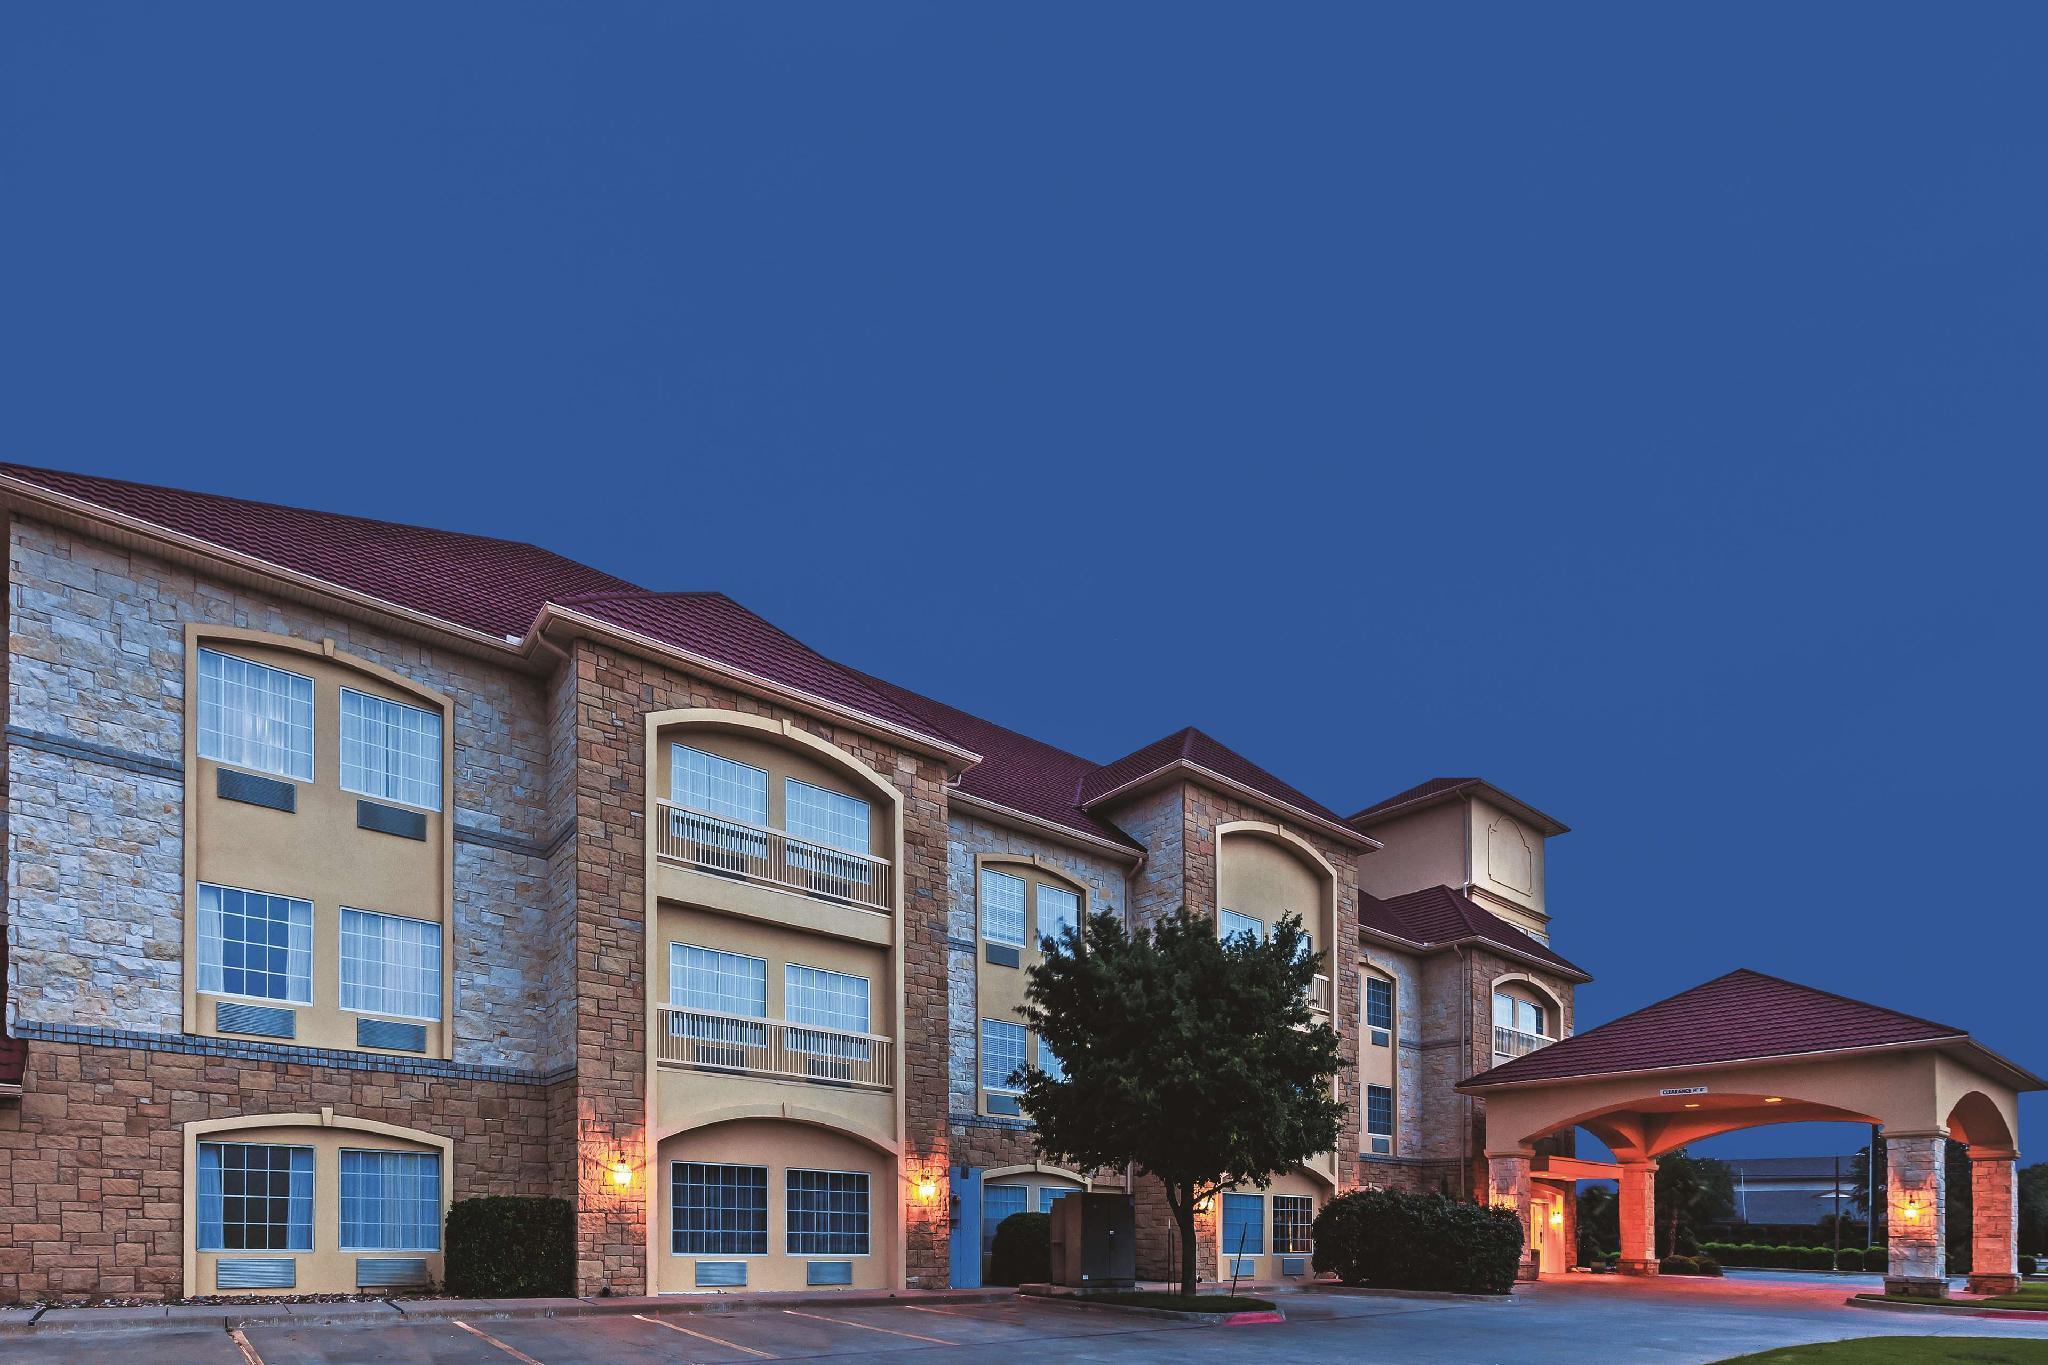 La Quinta Inn And Suites By Wyndham Granbury